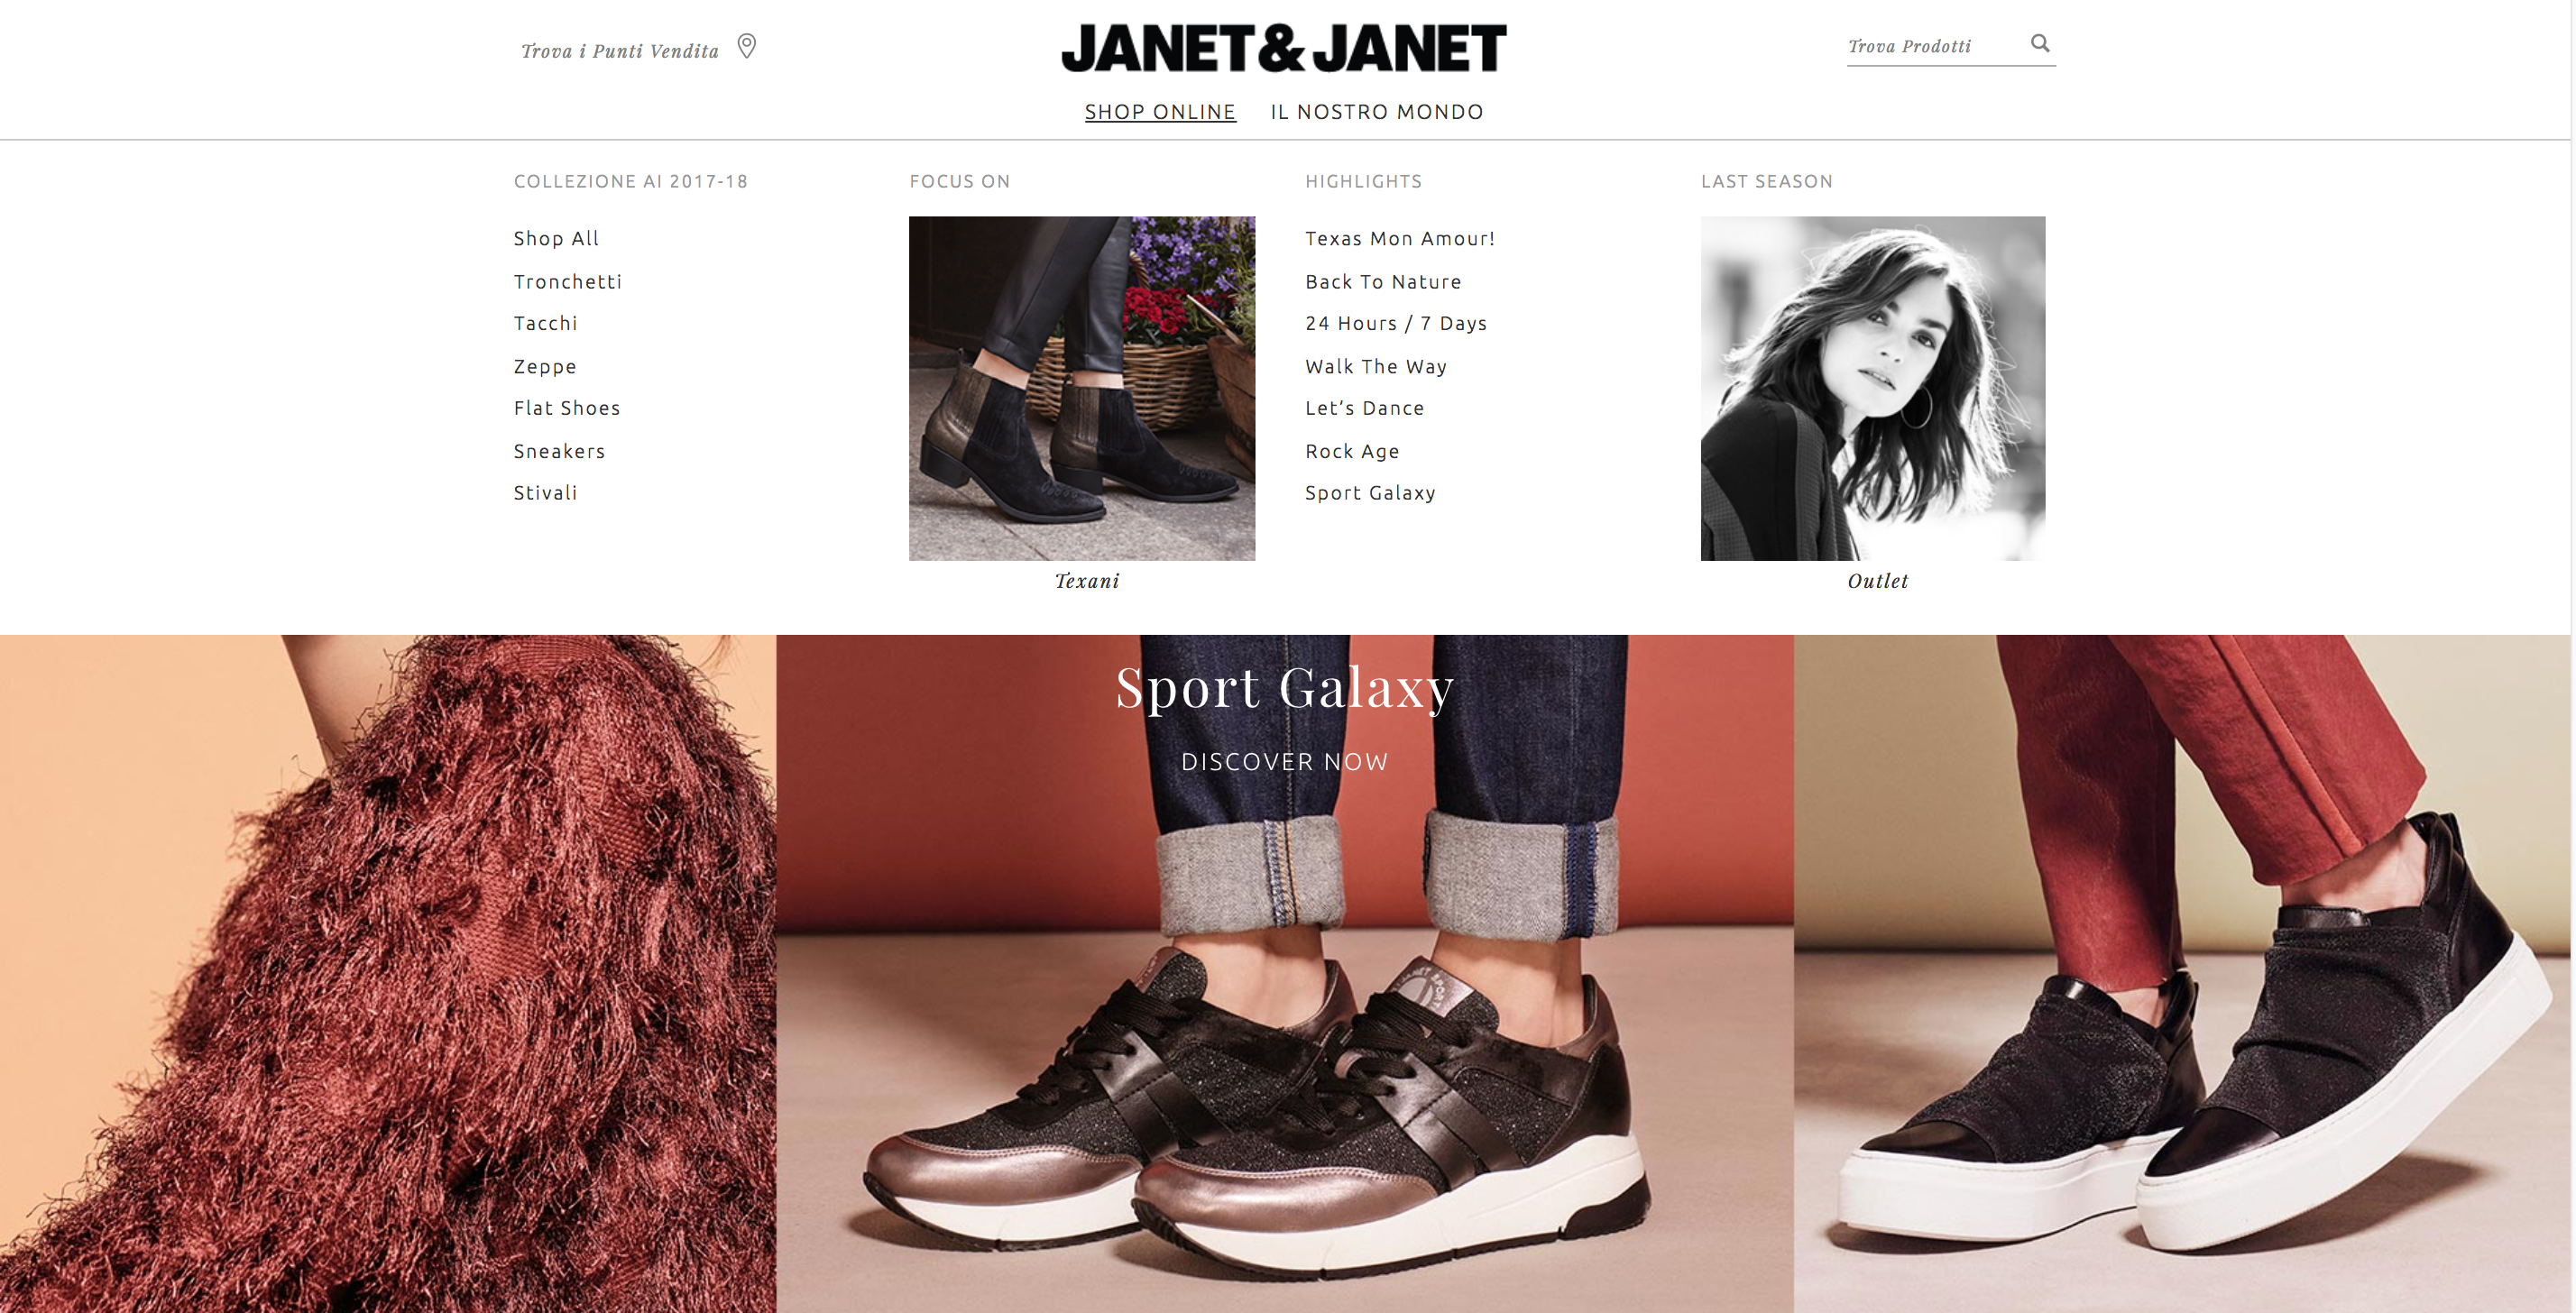 Janet & Janet menu